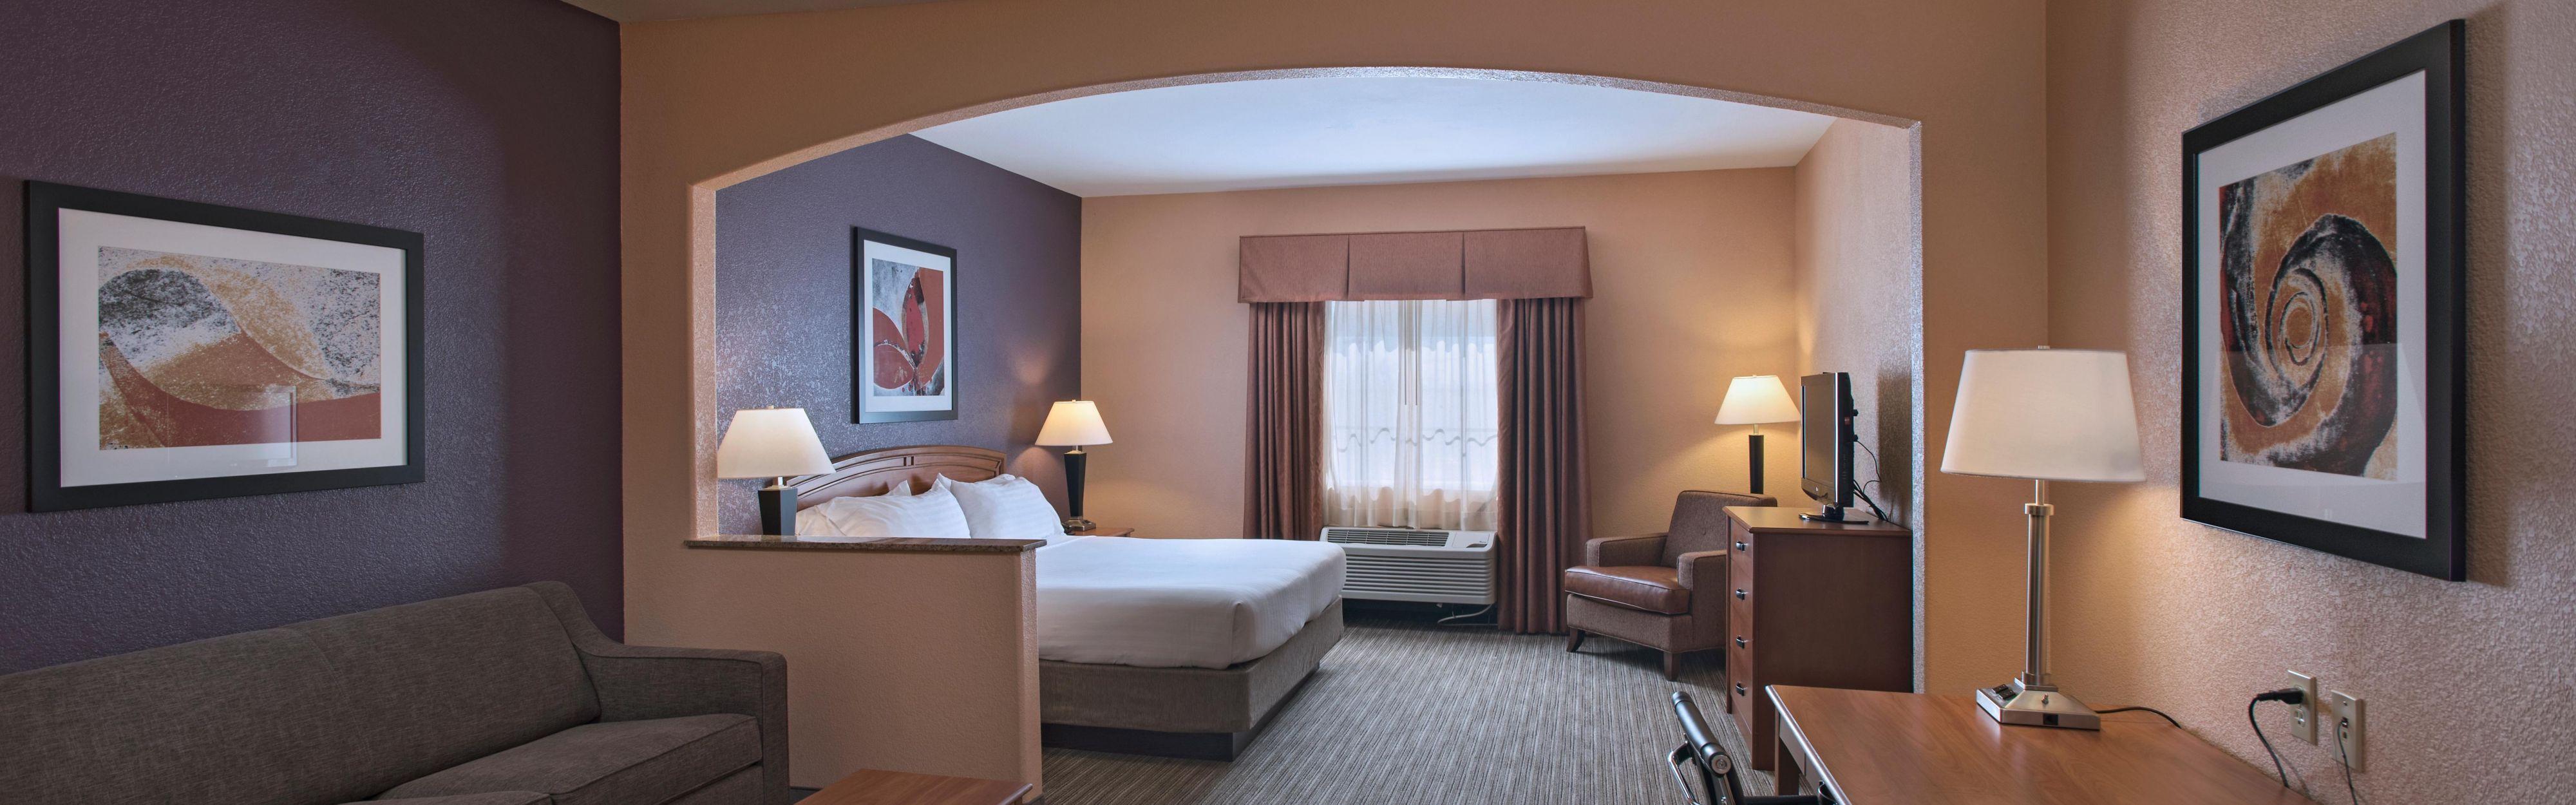 Holiday Inn Express & Suites Cedar Park (Nw Austin) image 1